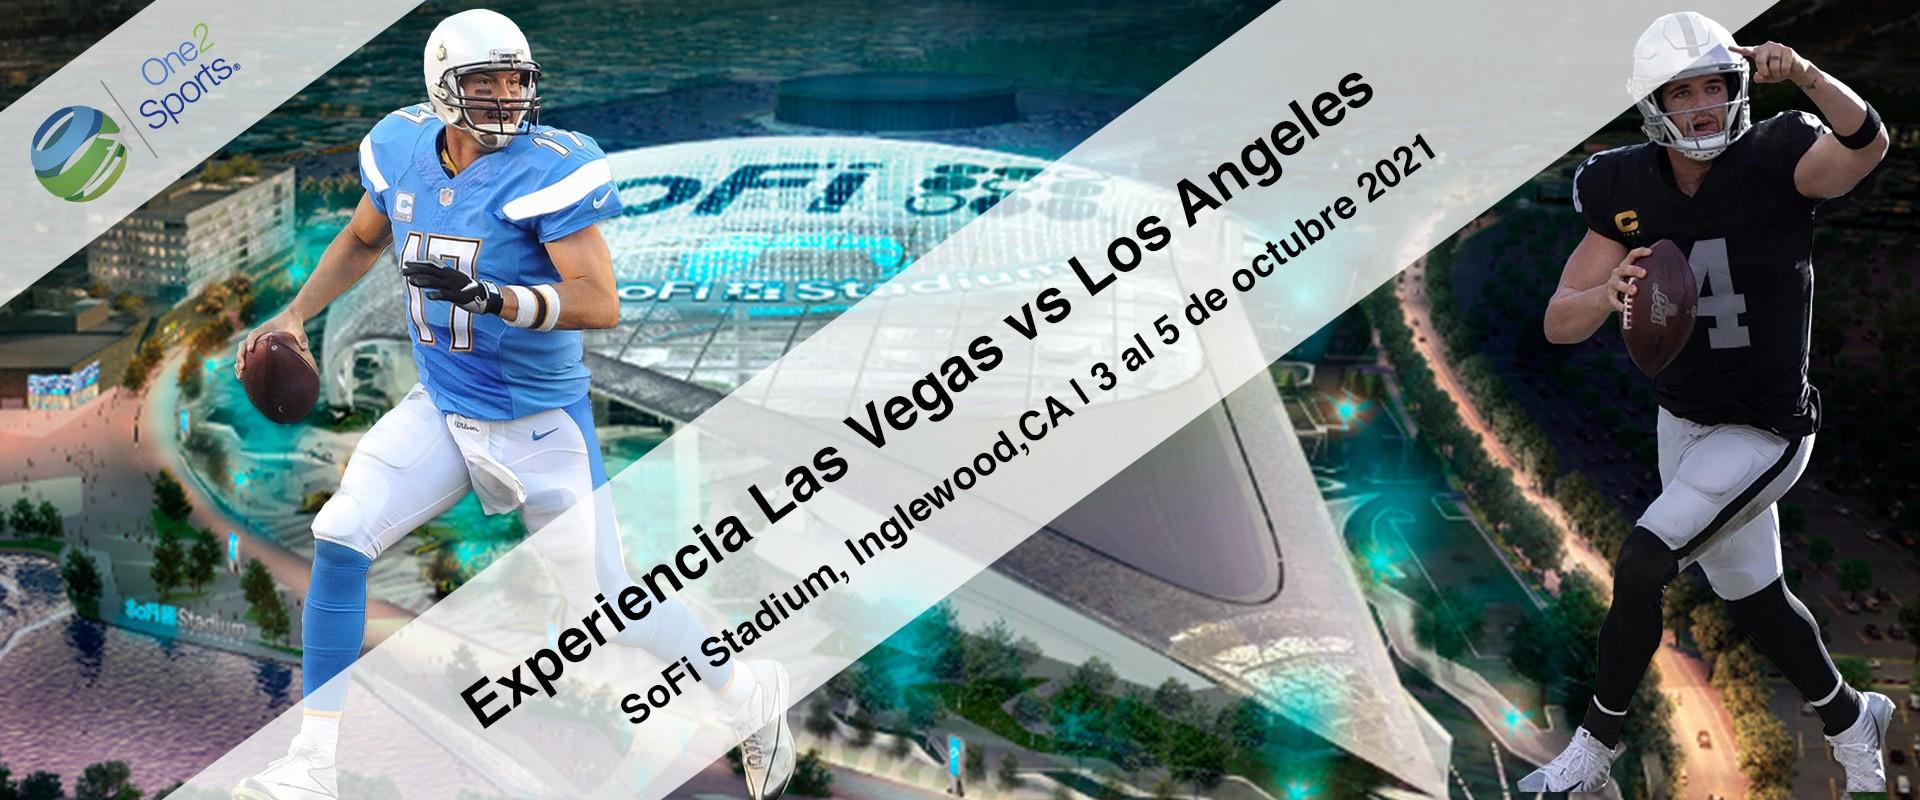 Los Angeles Chargers vs Las Vegas